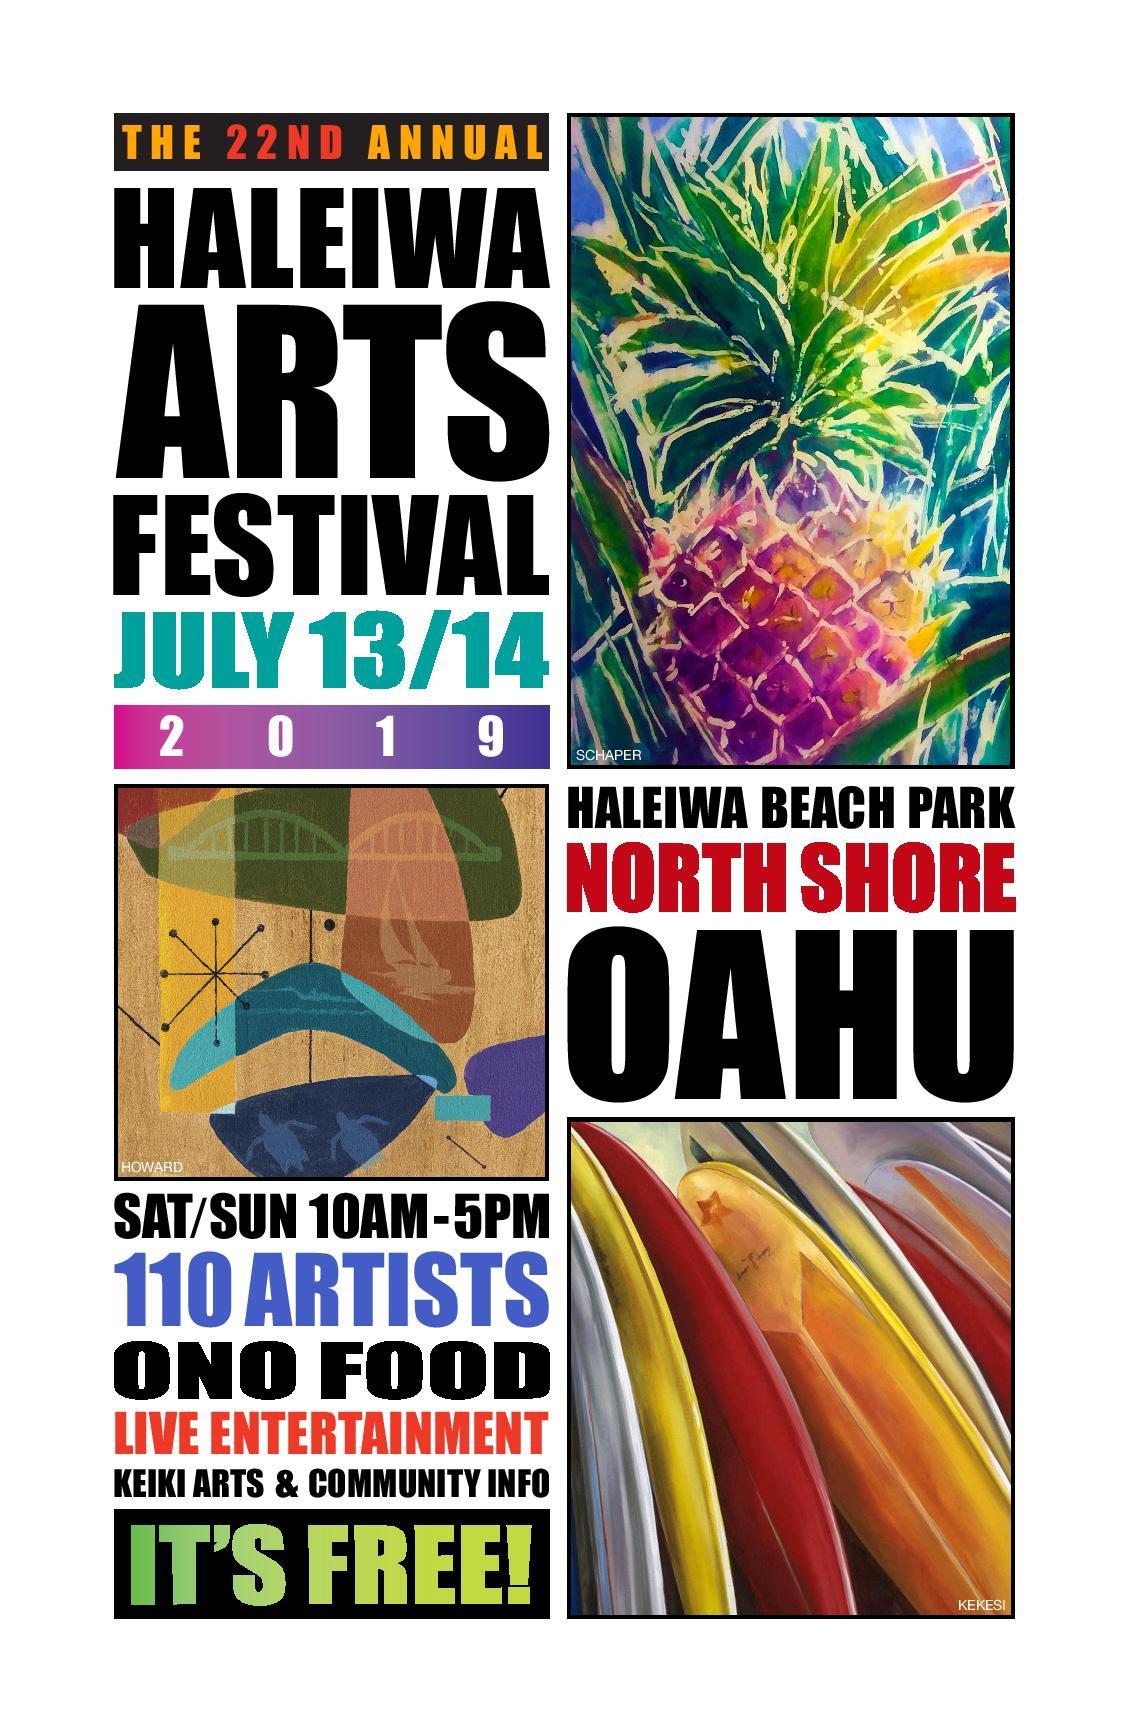 Haleiwa Arts Festival 2019